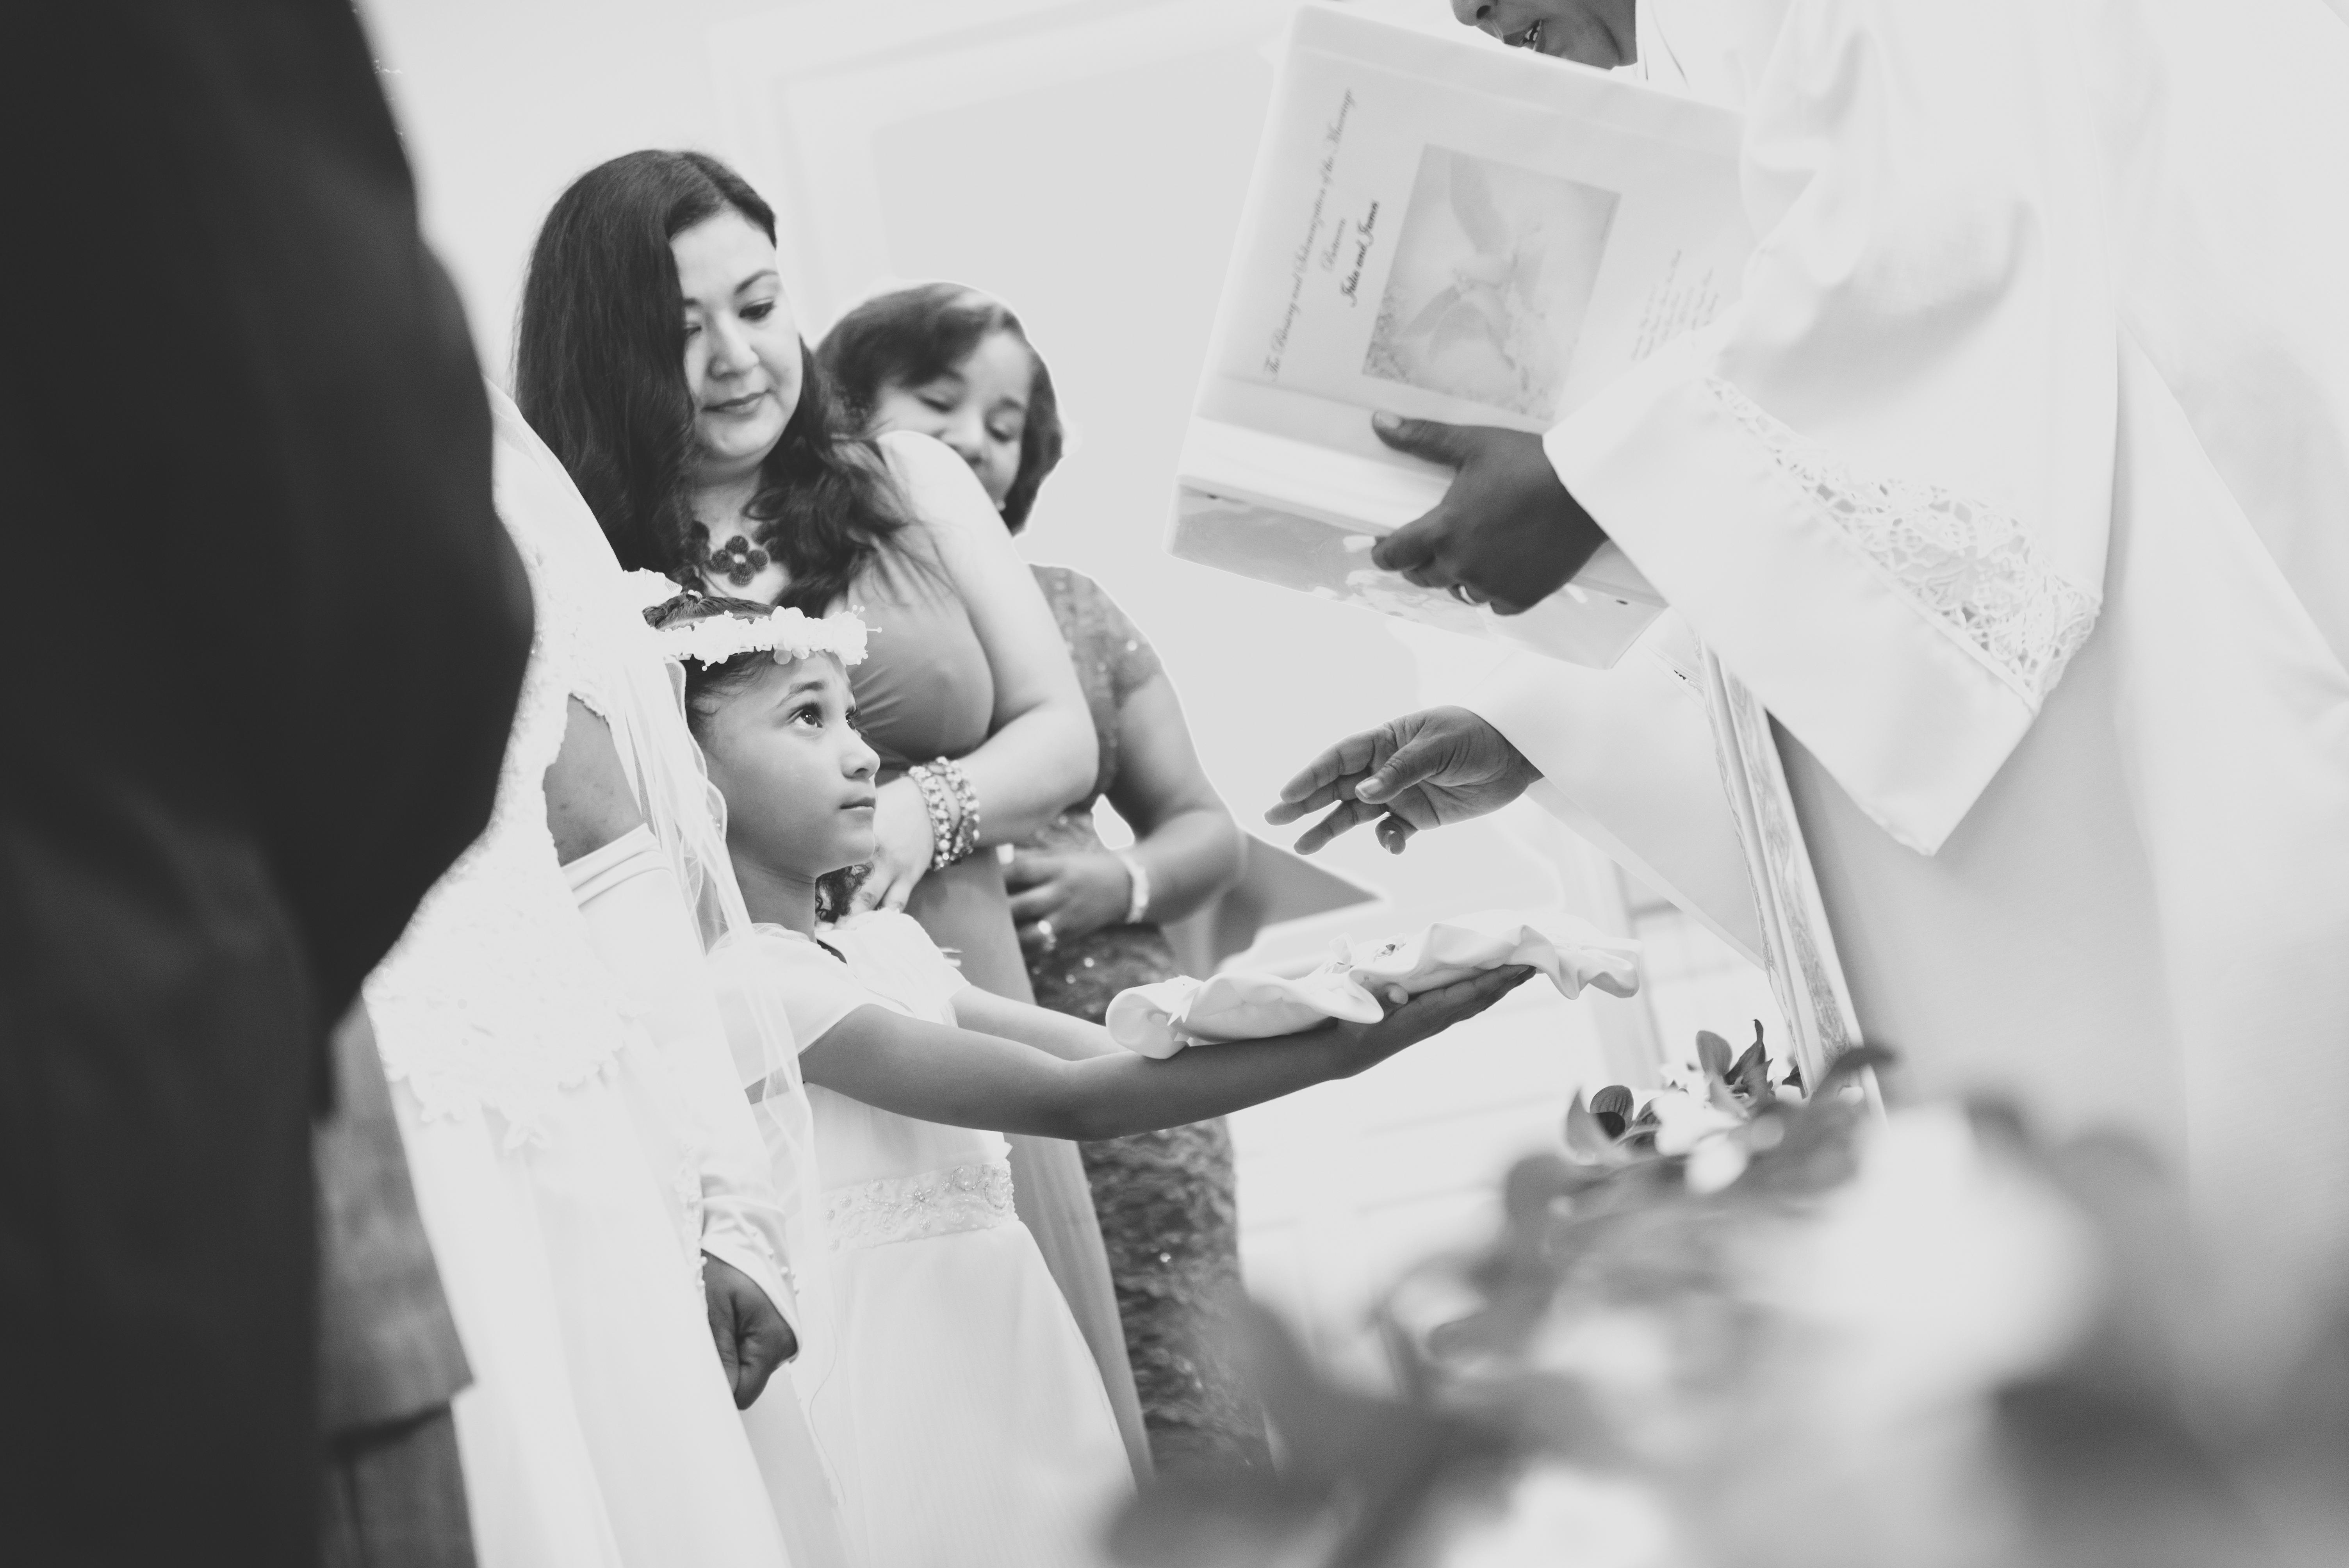 Upper marlboro wedding